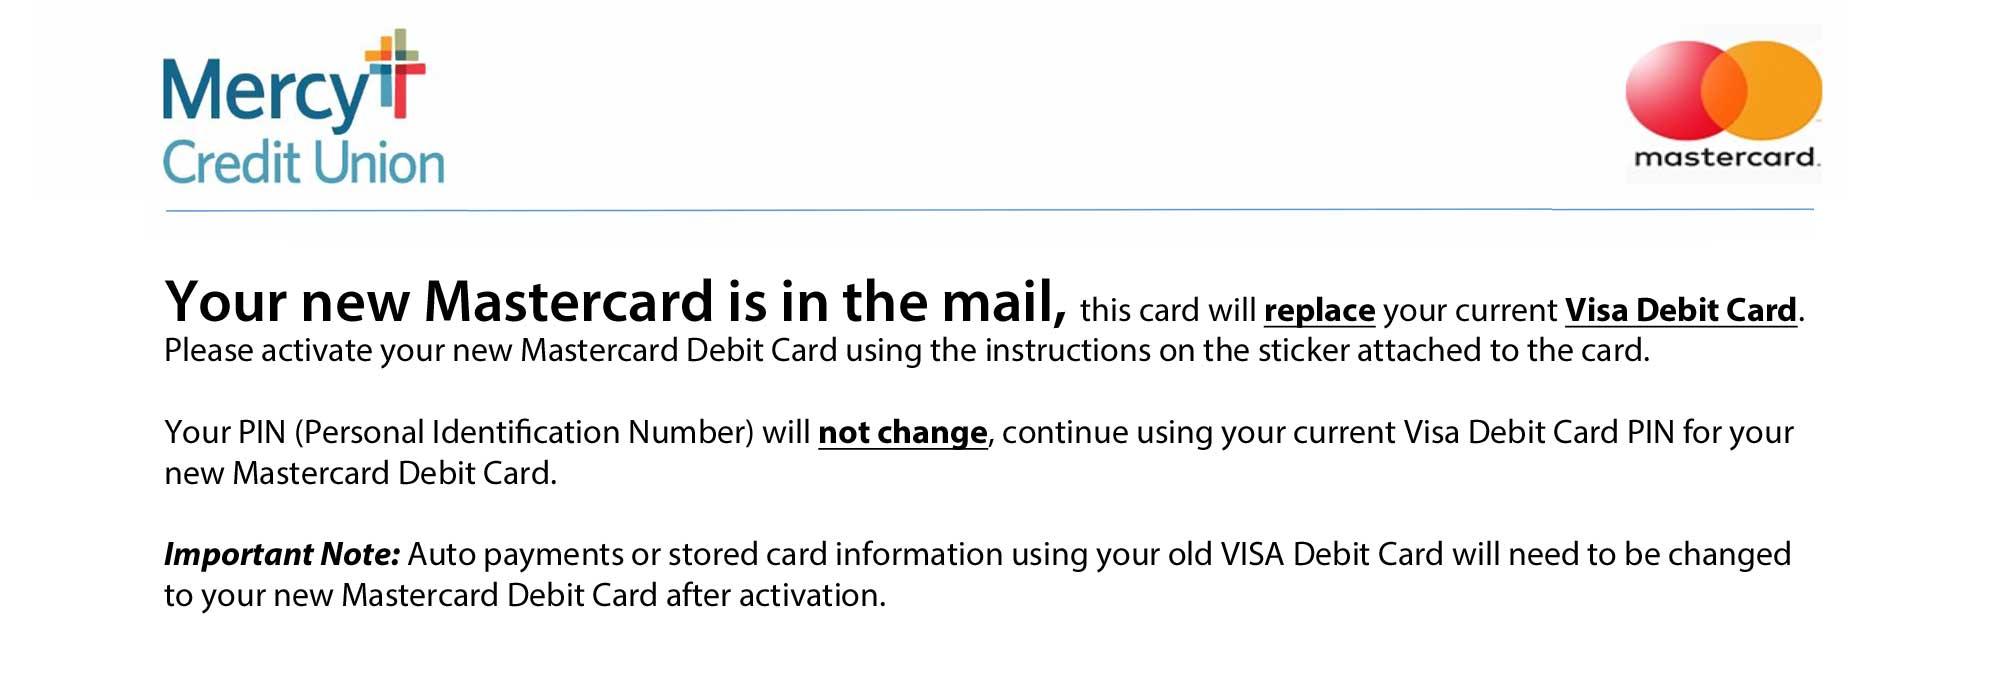 Mastercard Debit Announcement